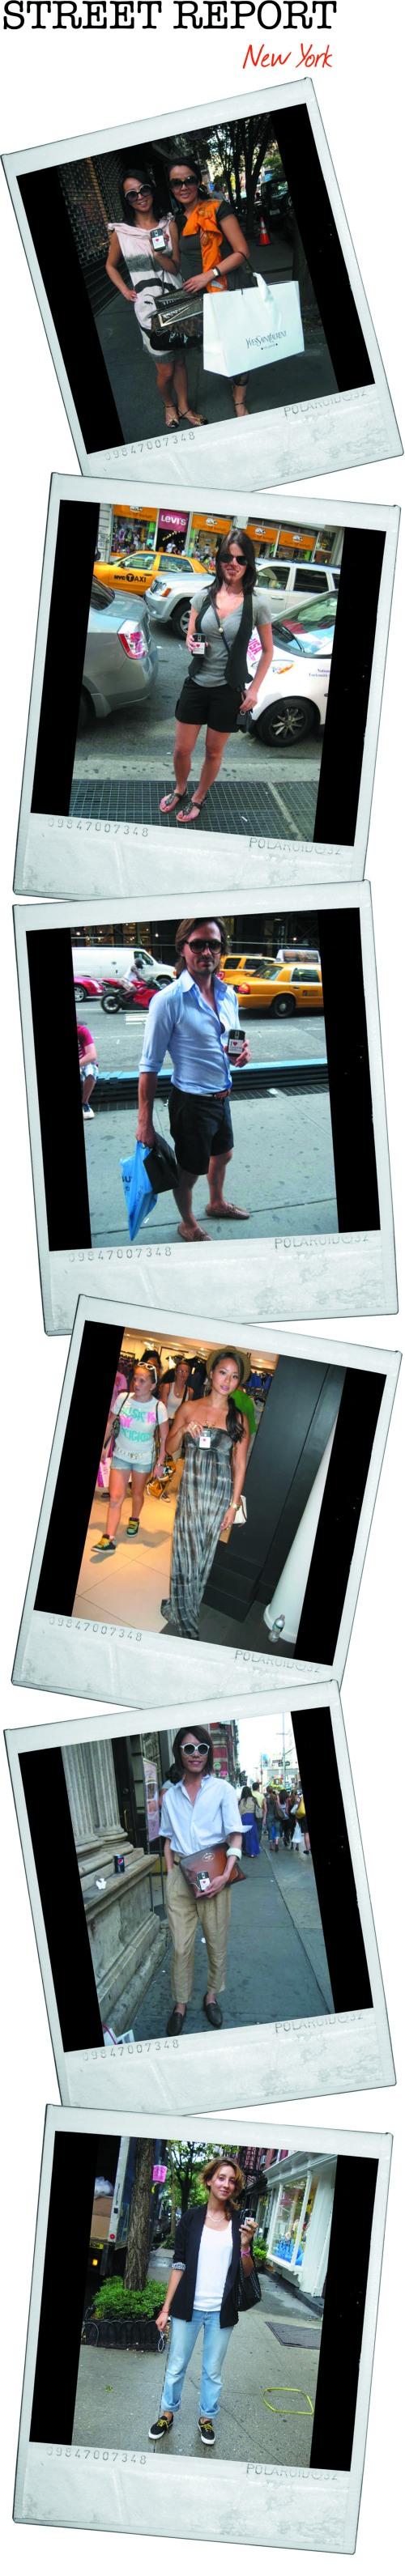 Street Report New York